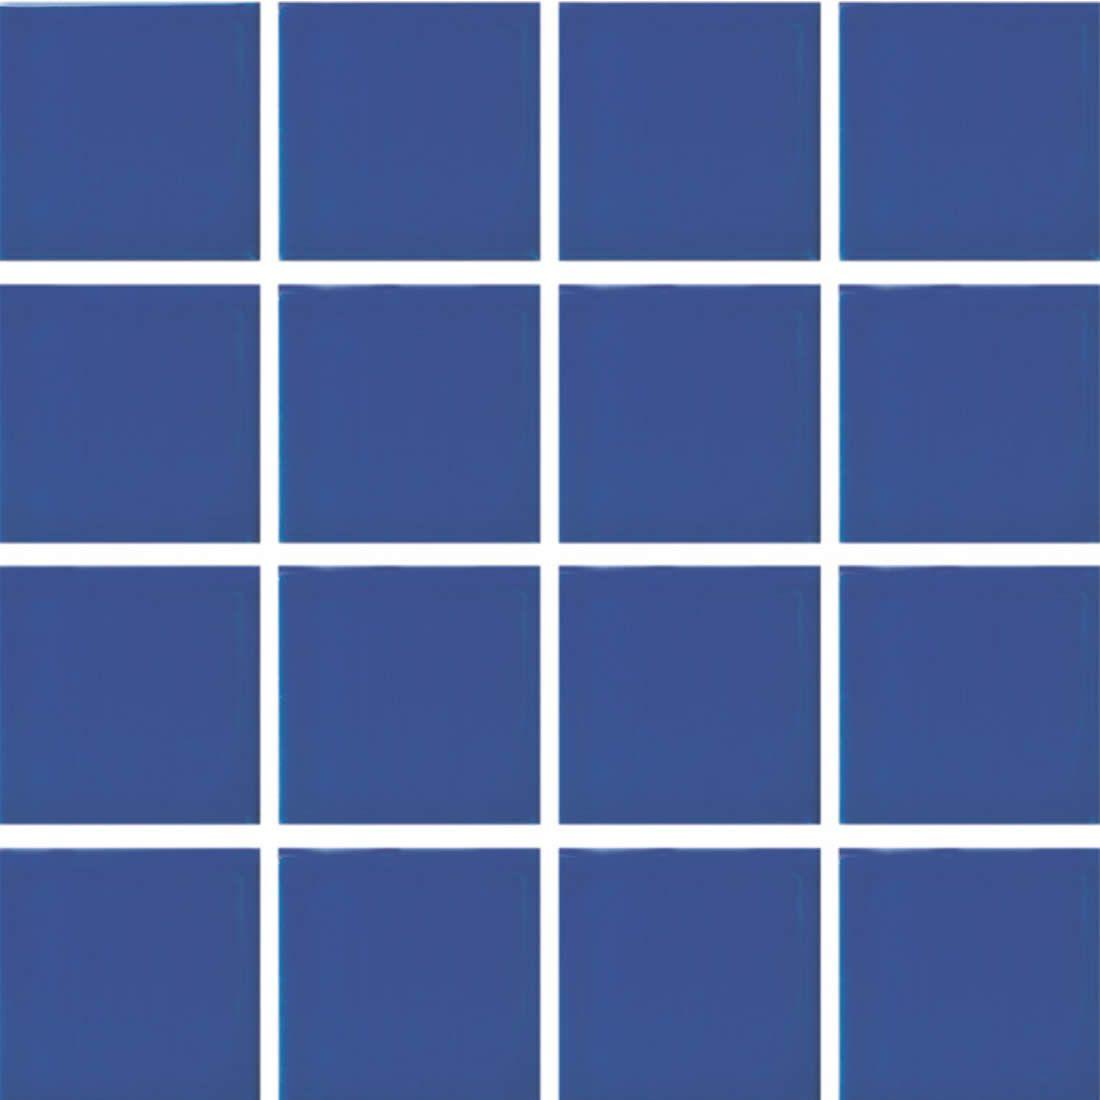 Porcelanato Portobello Pastilha 7,5 x 7,5 Prisma Blu Brilhante Ref 86349